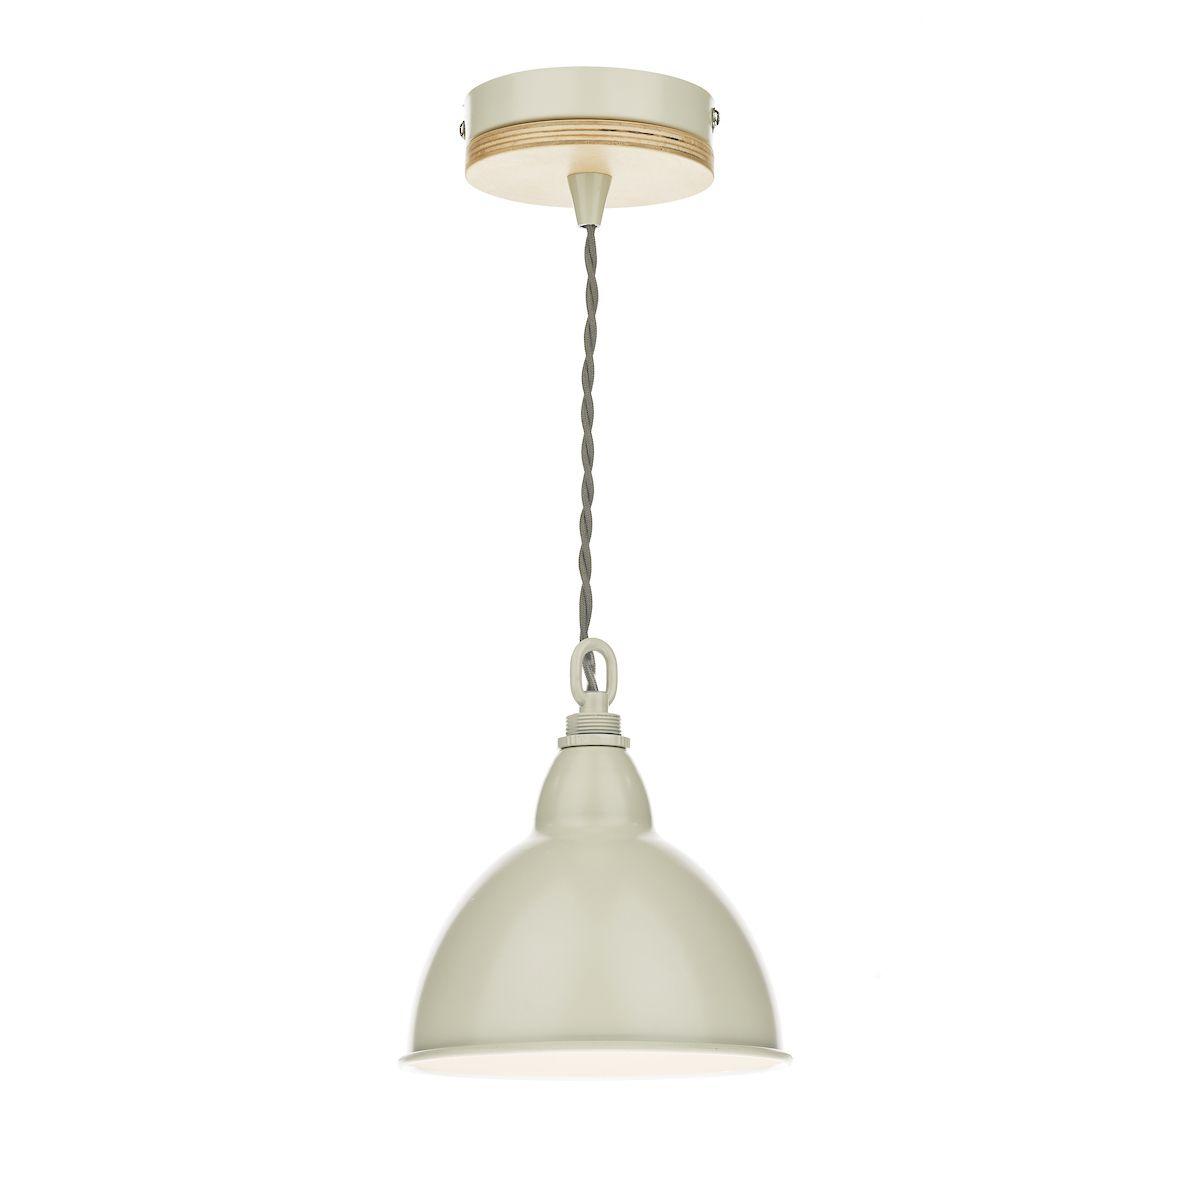 kremowa lampa wisząca